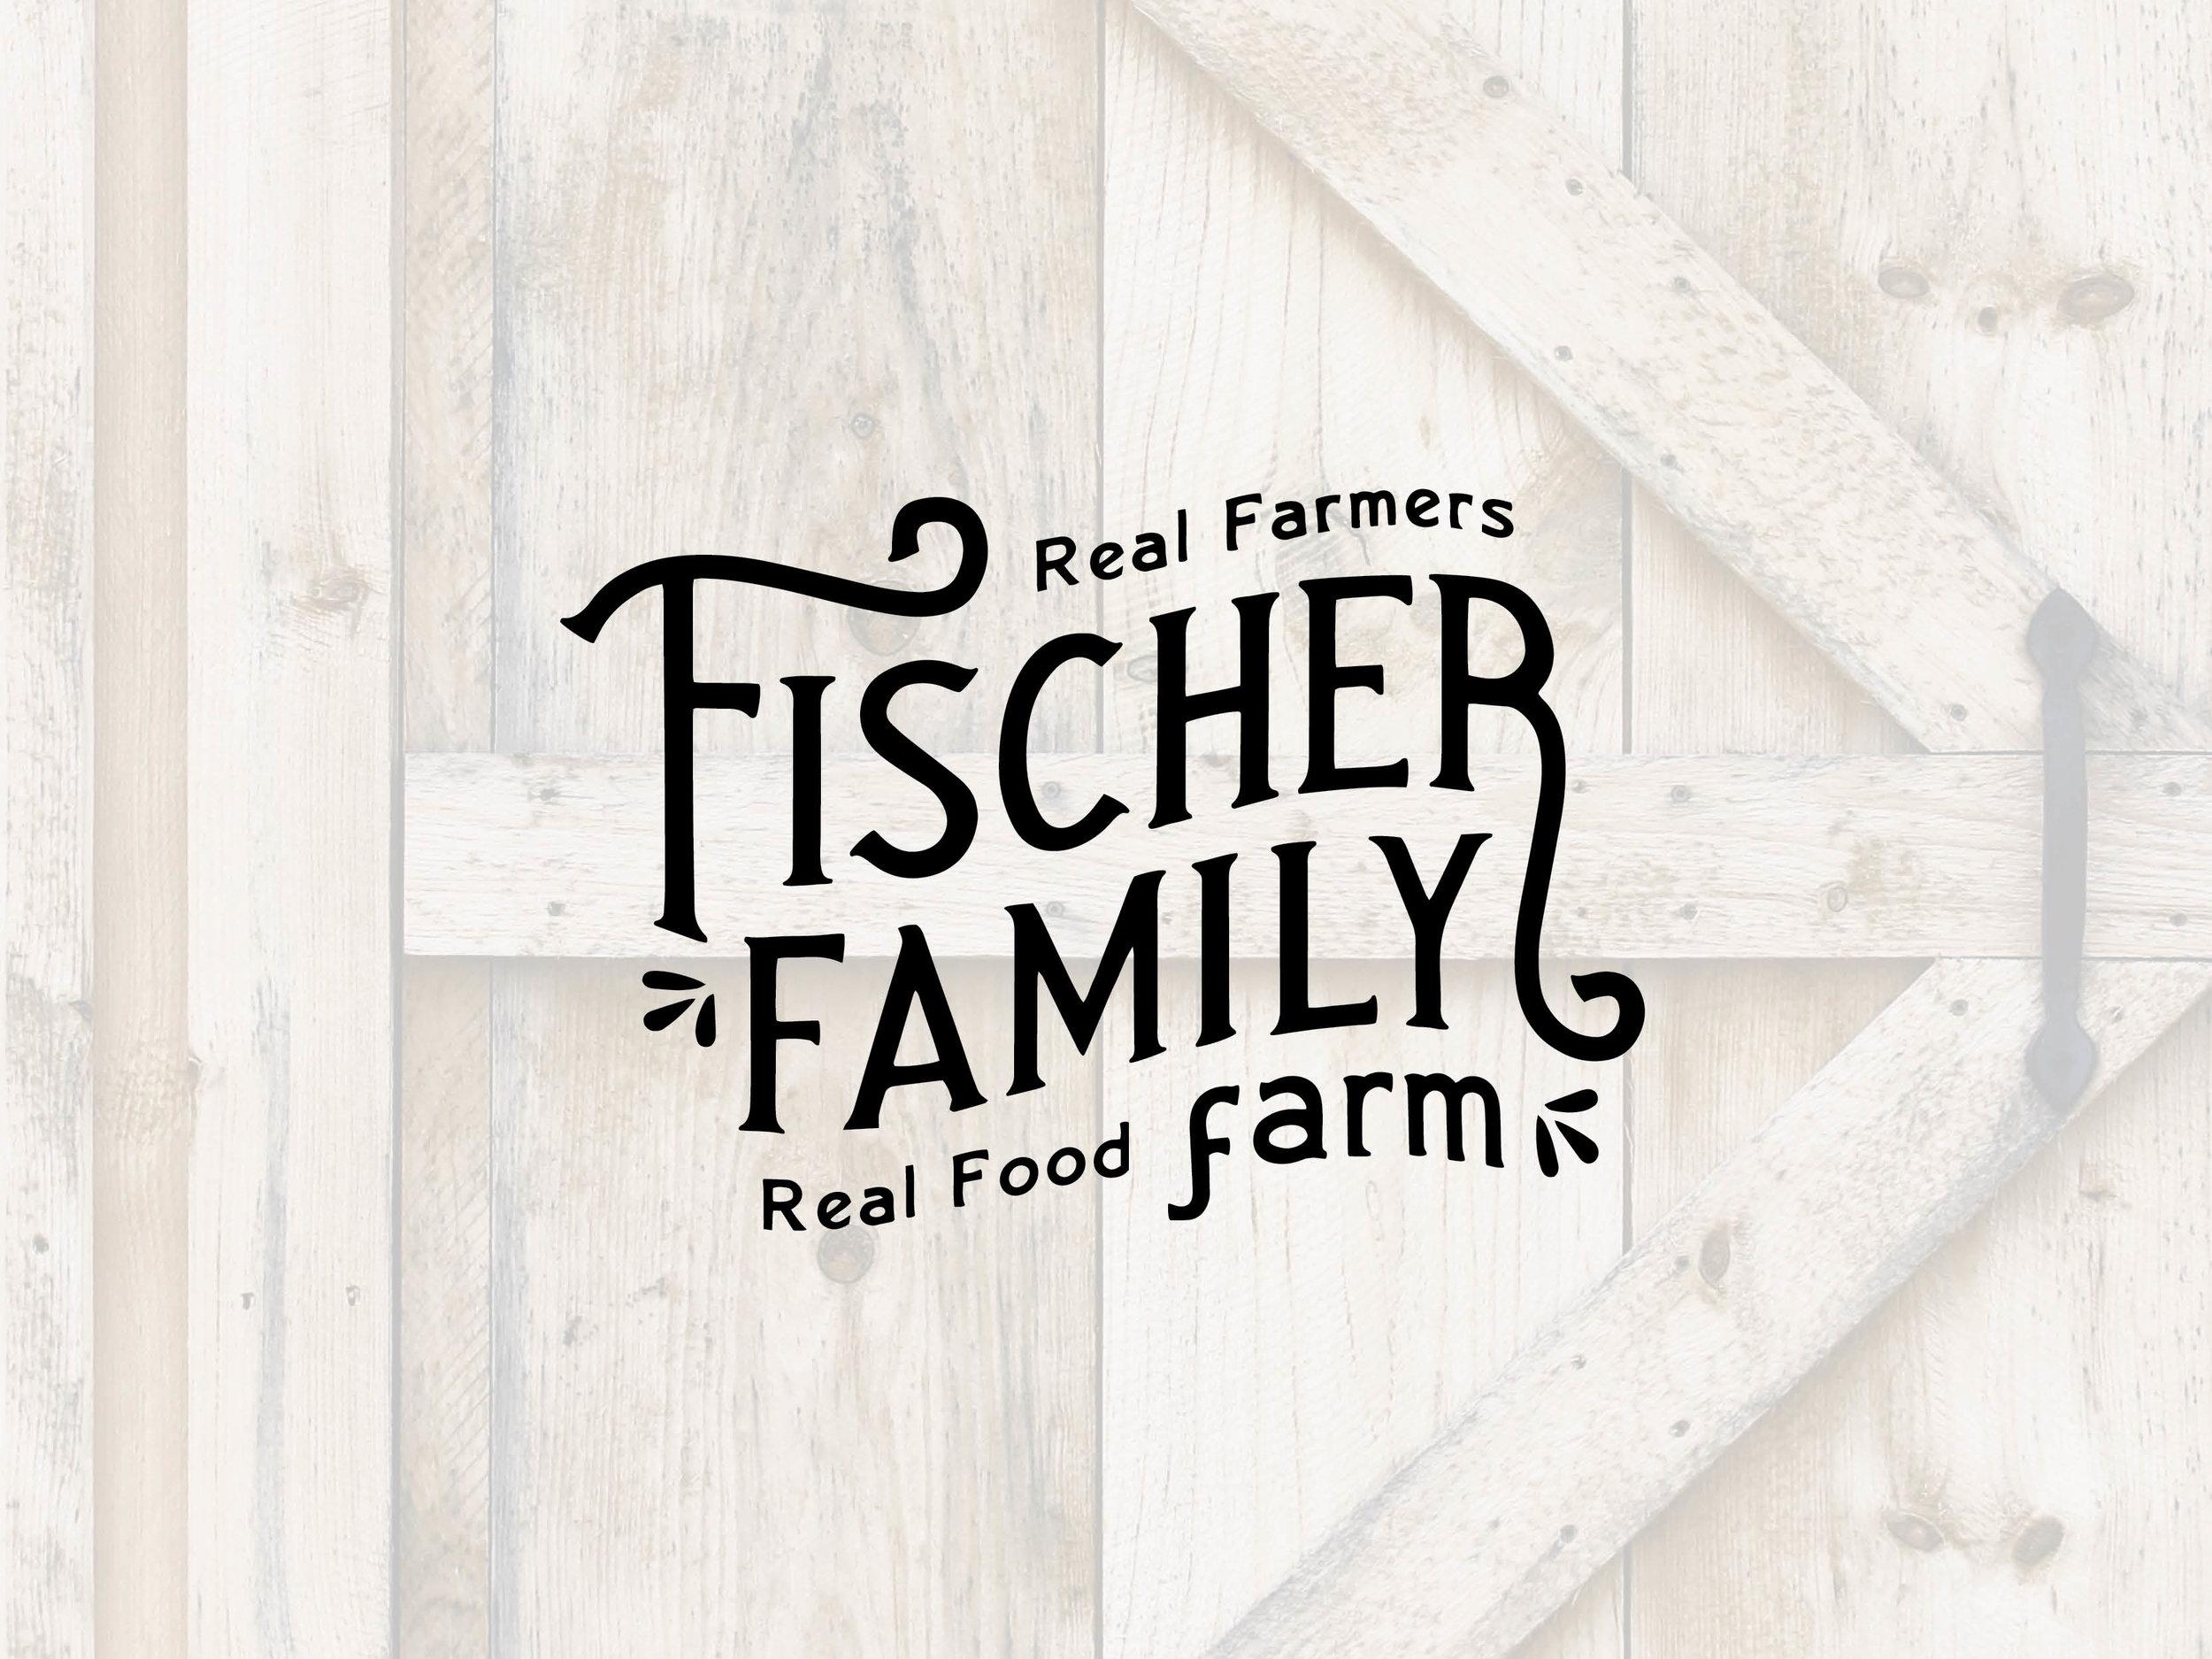 fischer-family-farm-logo